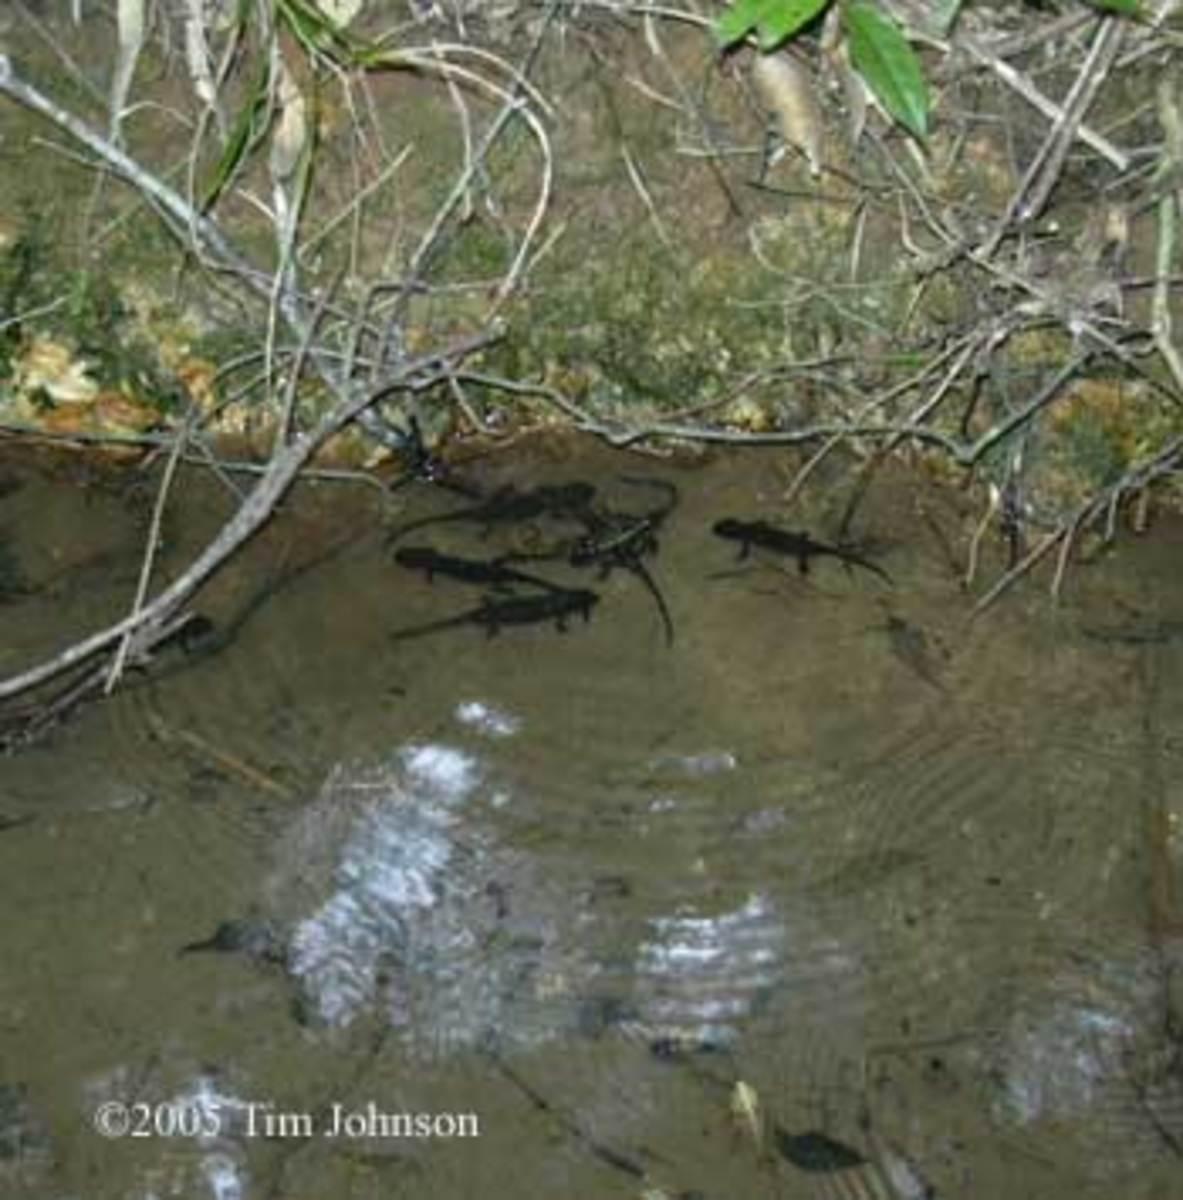 Axolotl in the wild CC: Tim Johnson, 2005